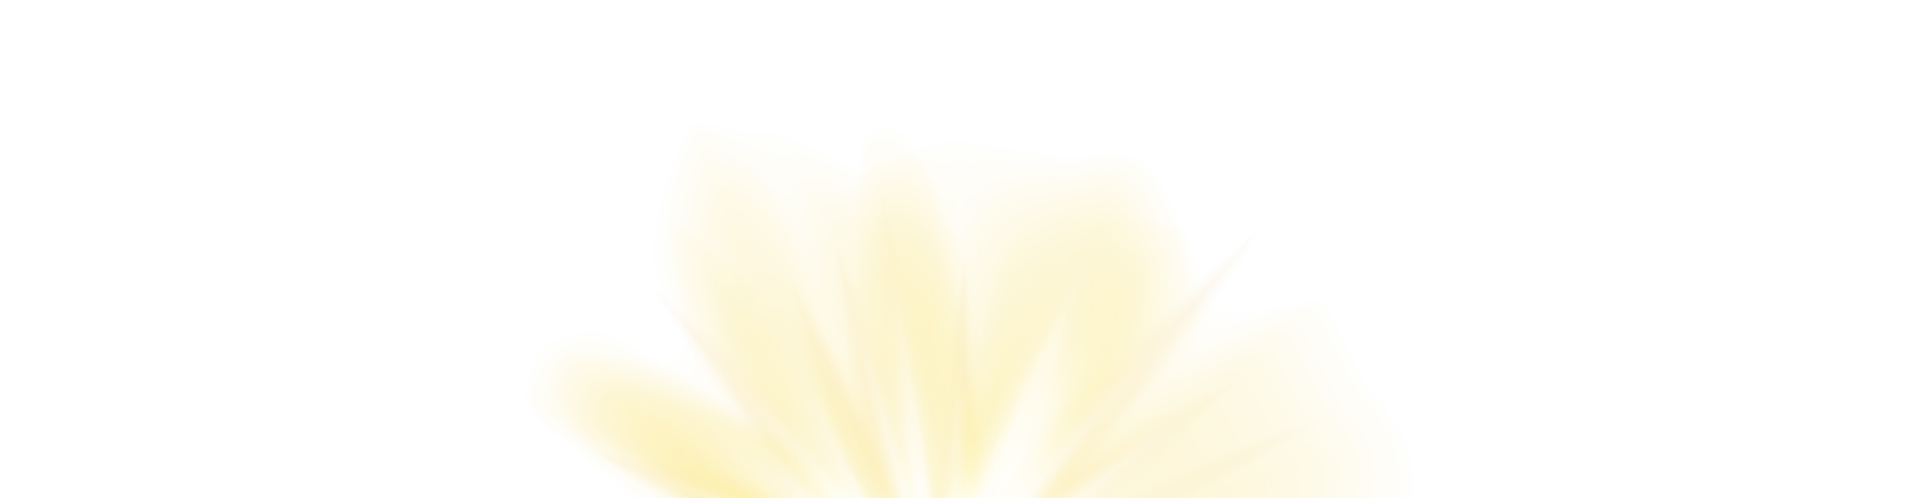 luz-medalha.png